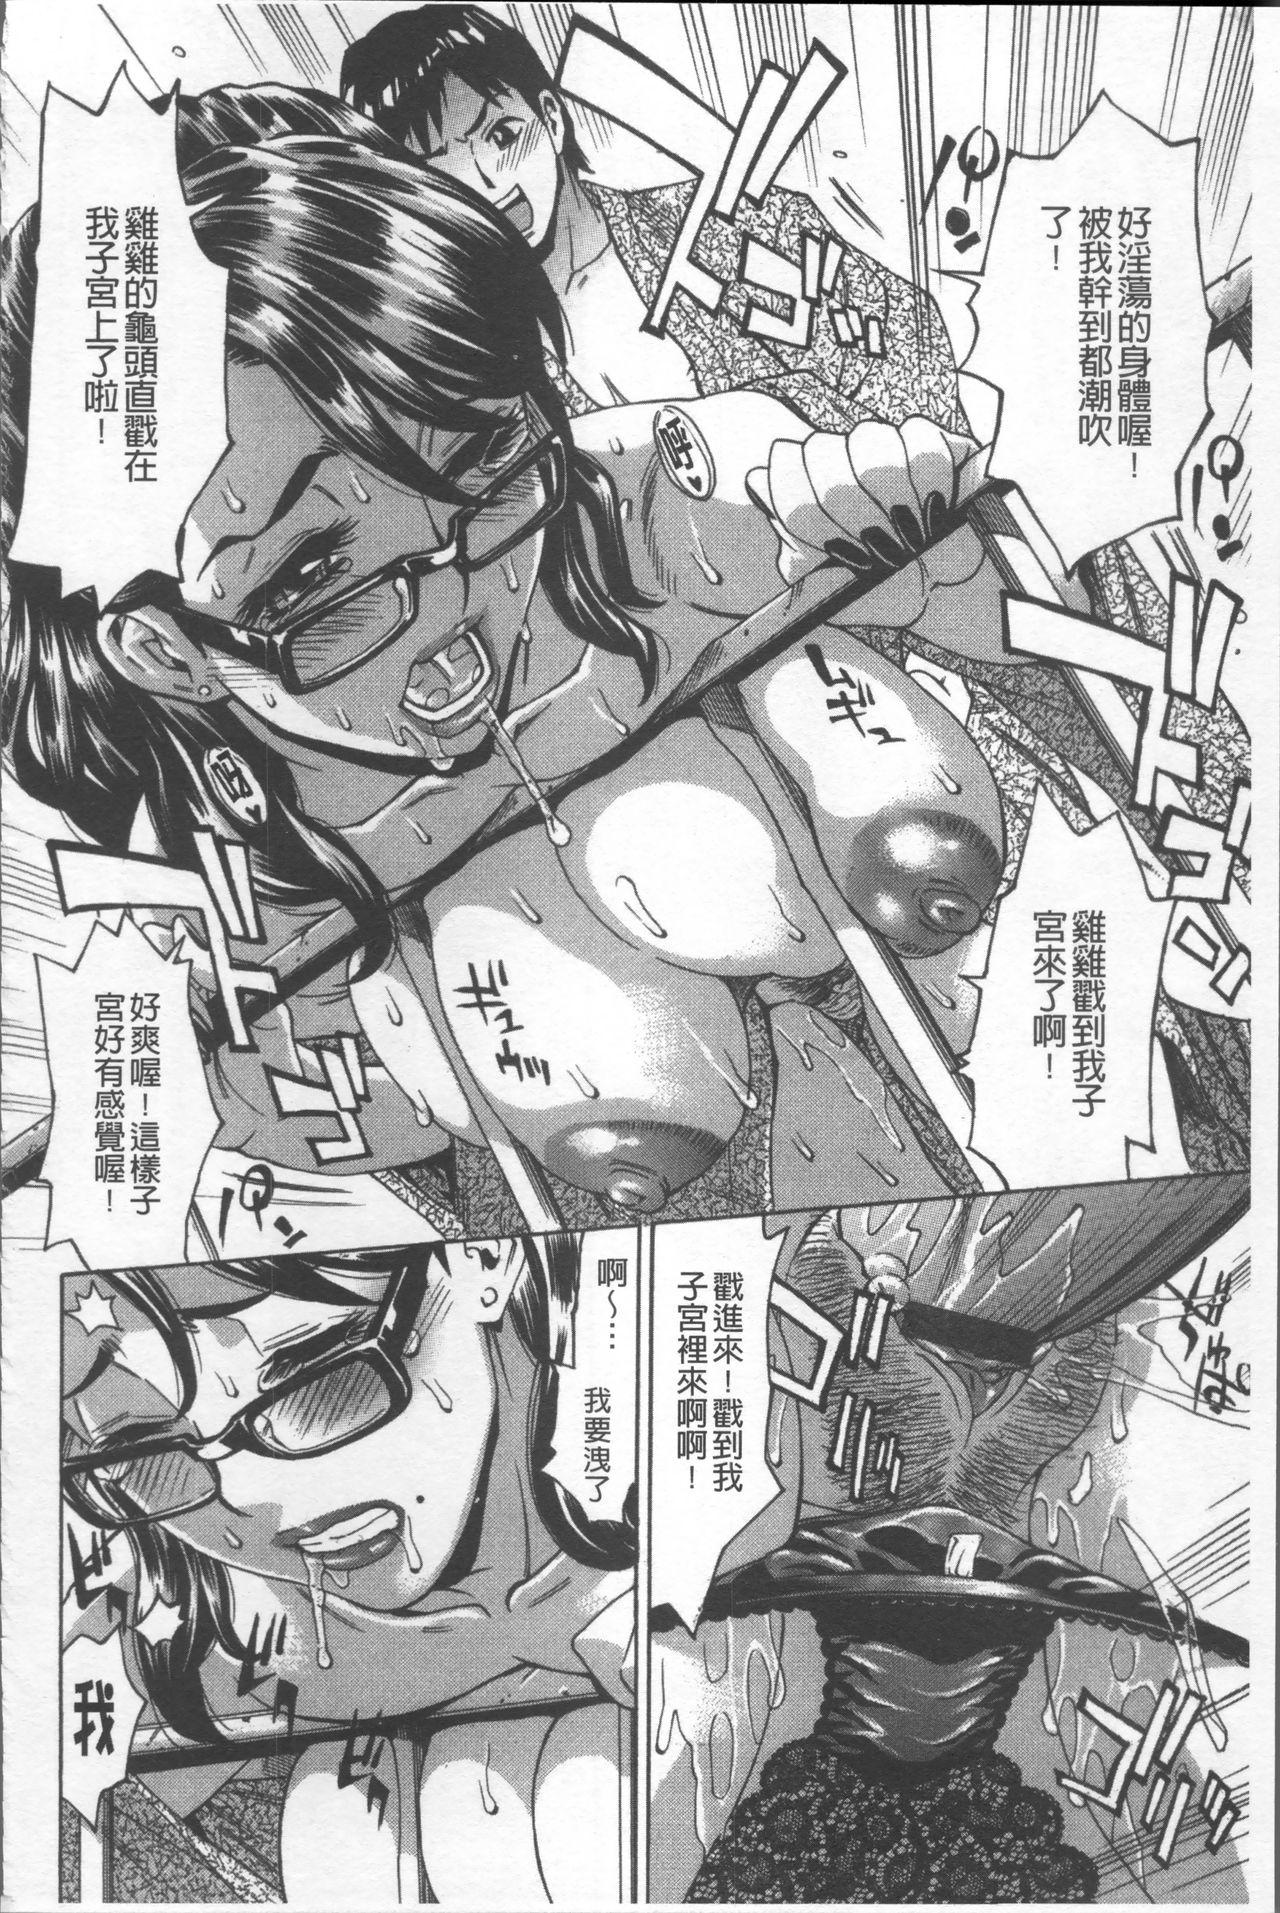 Hitozuma Kanshasai - SUPER EROTIC WIFE'S FESTIVAL 157